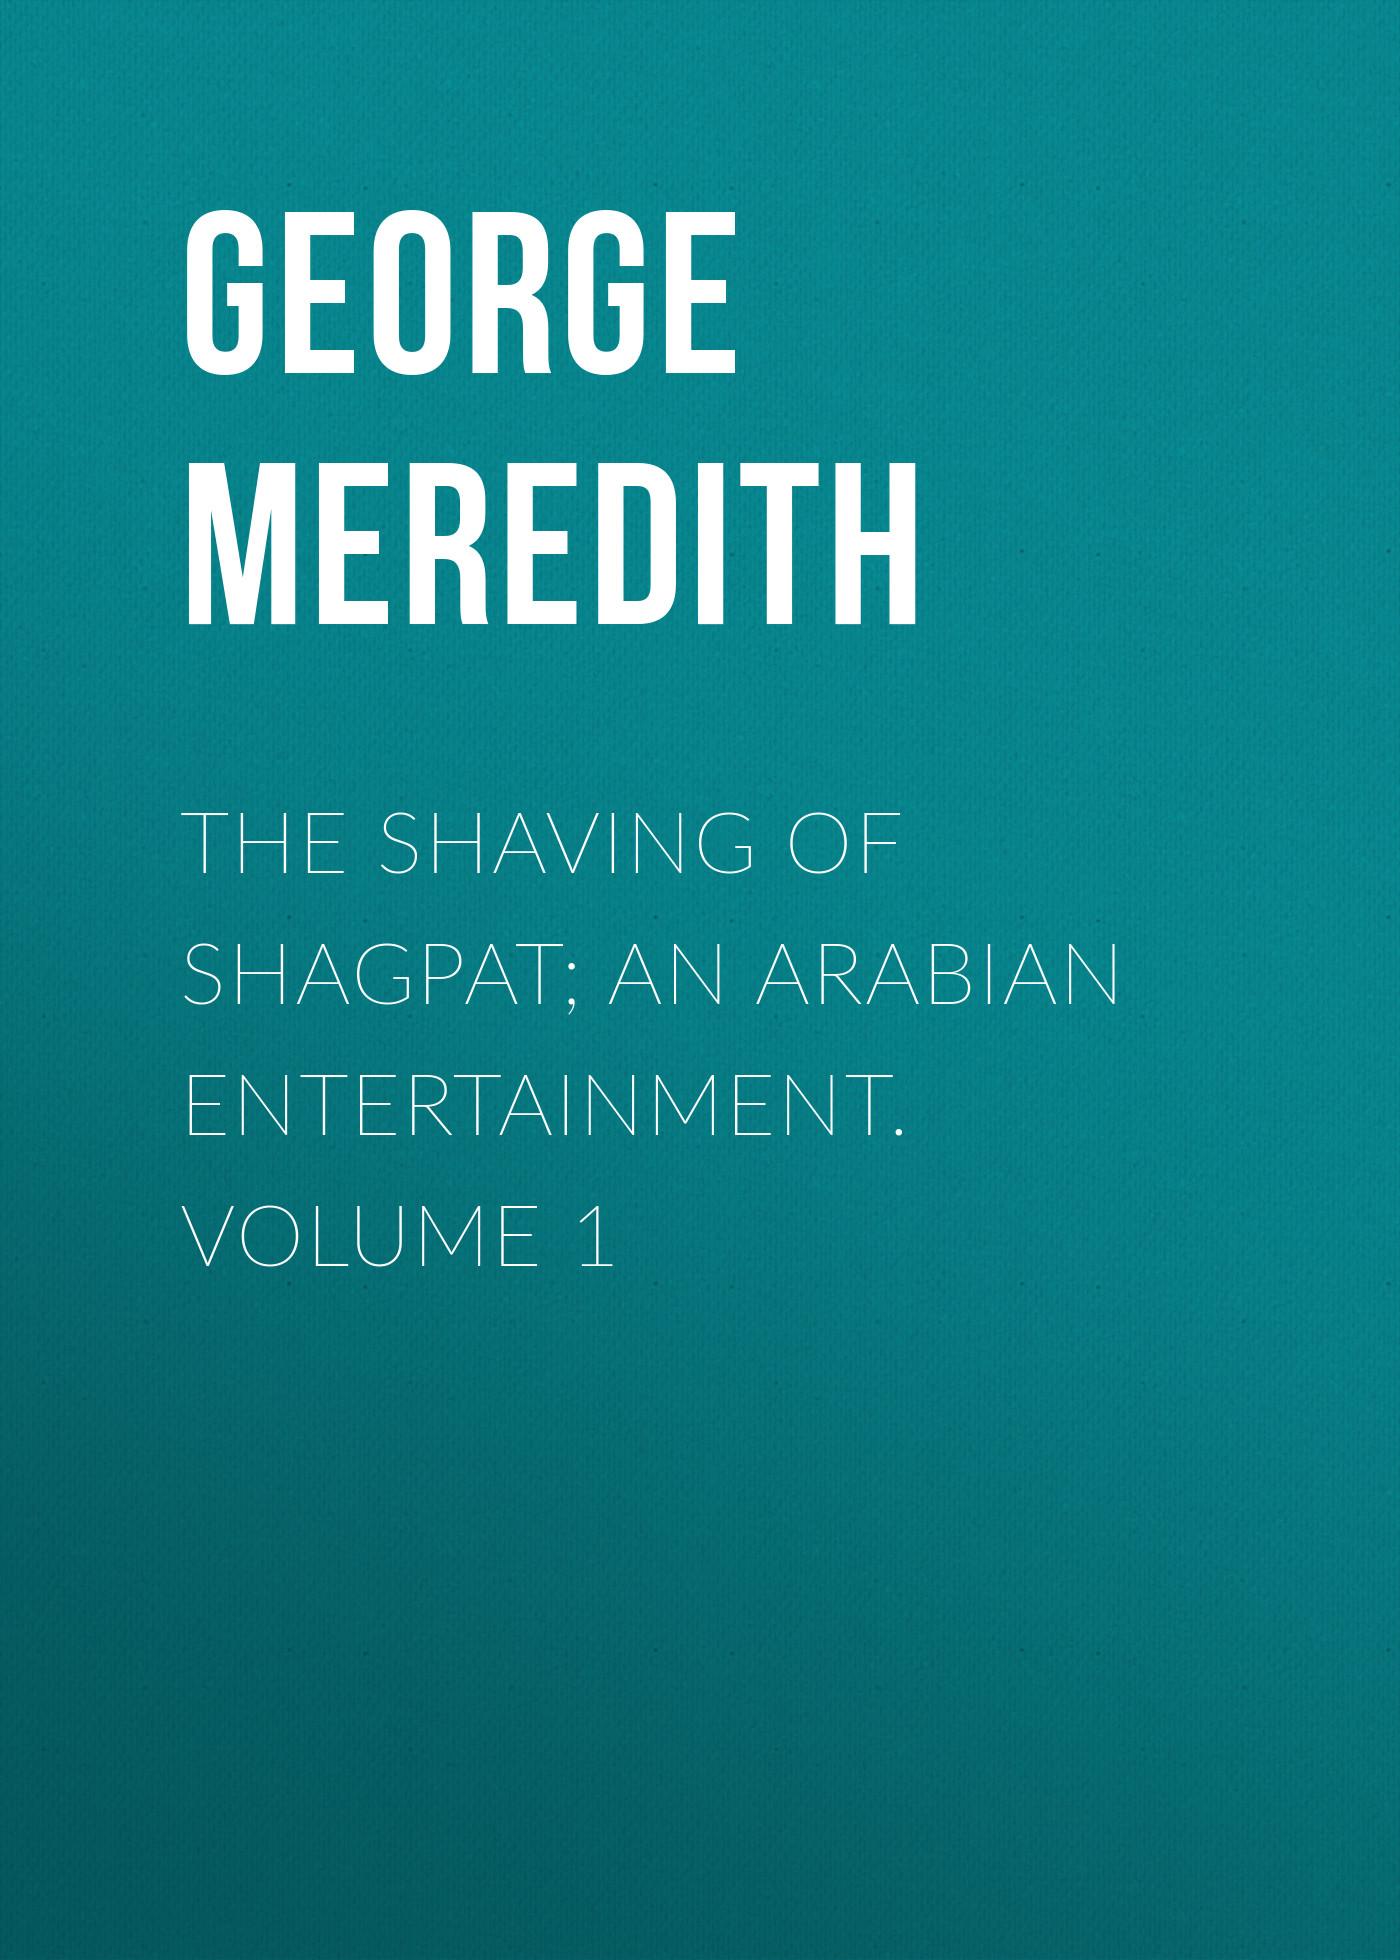 The Shaving of Shagpat; an Arabian entertainment. Volume 1